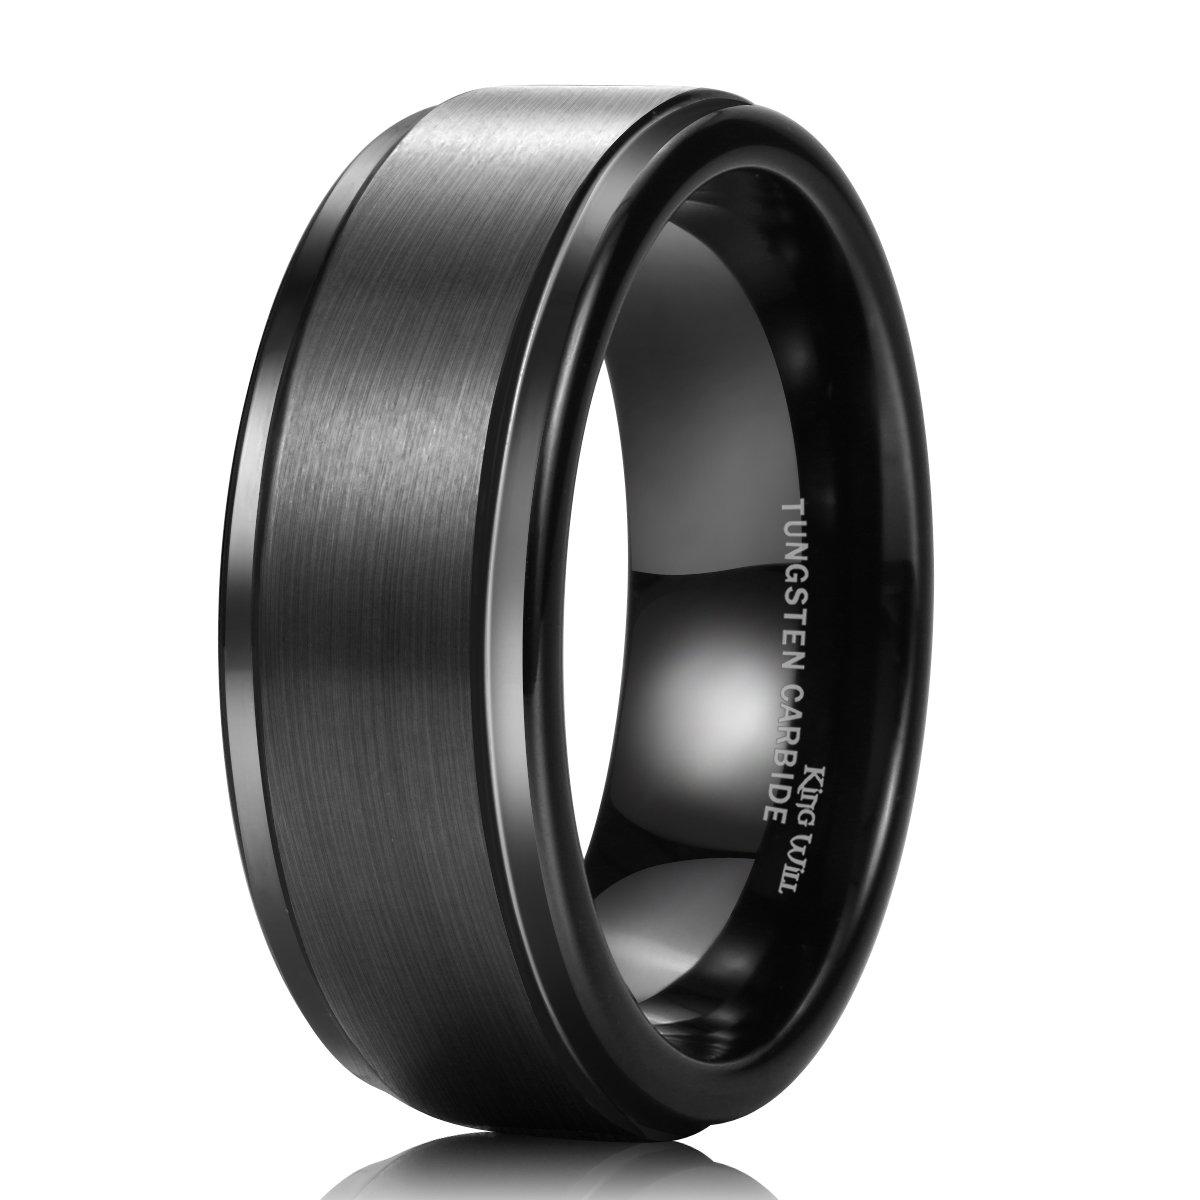 King Will BASIC 8mm Black High Polish Matte Finish Tungsten Men's Wedding Ring Comfort Fit 9